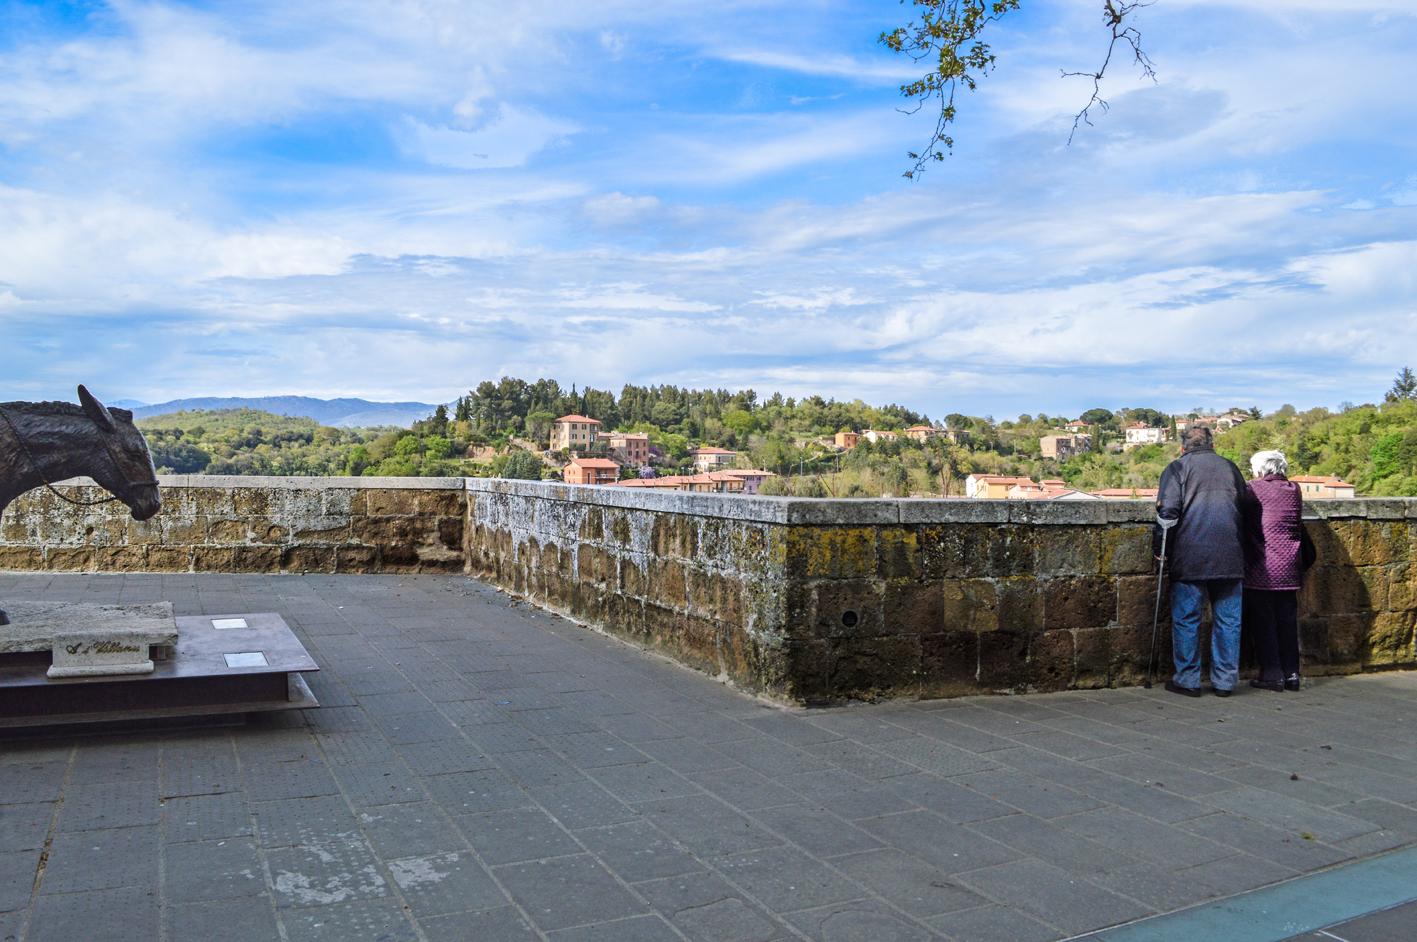 34 #WhereToGo: Pitigliano (Toscana)